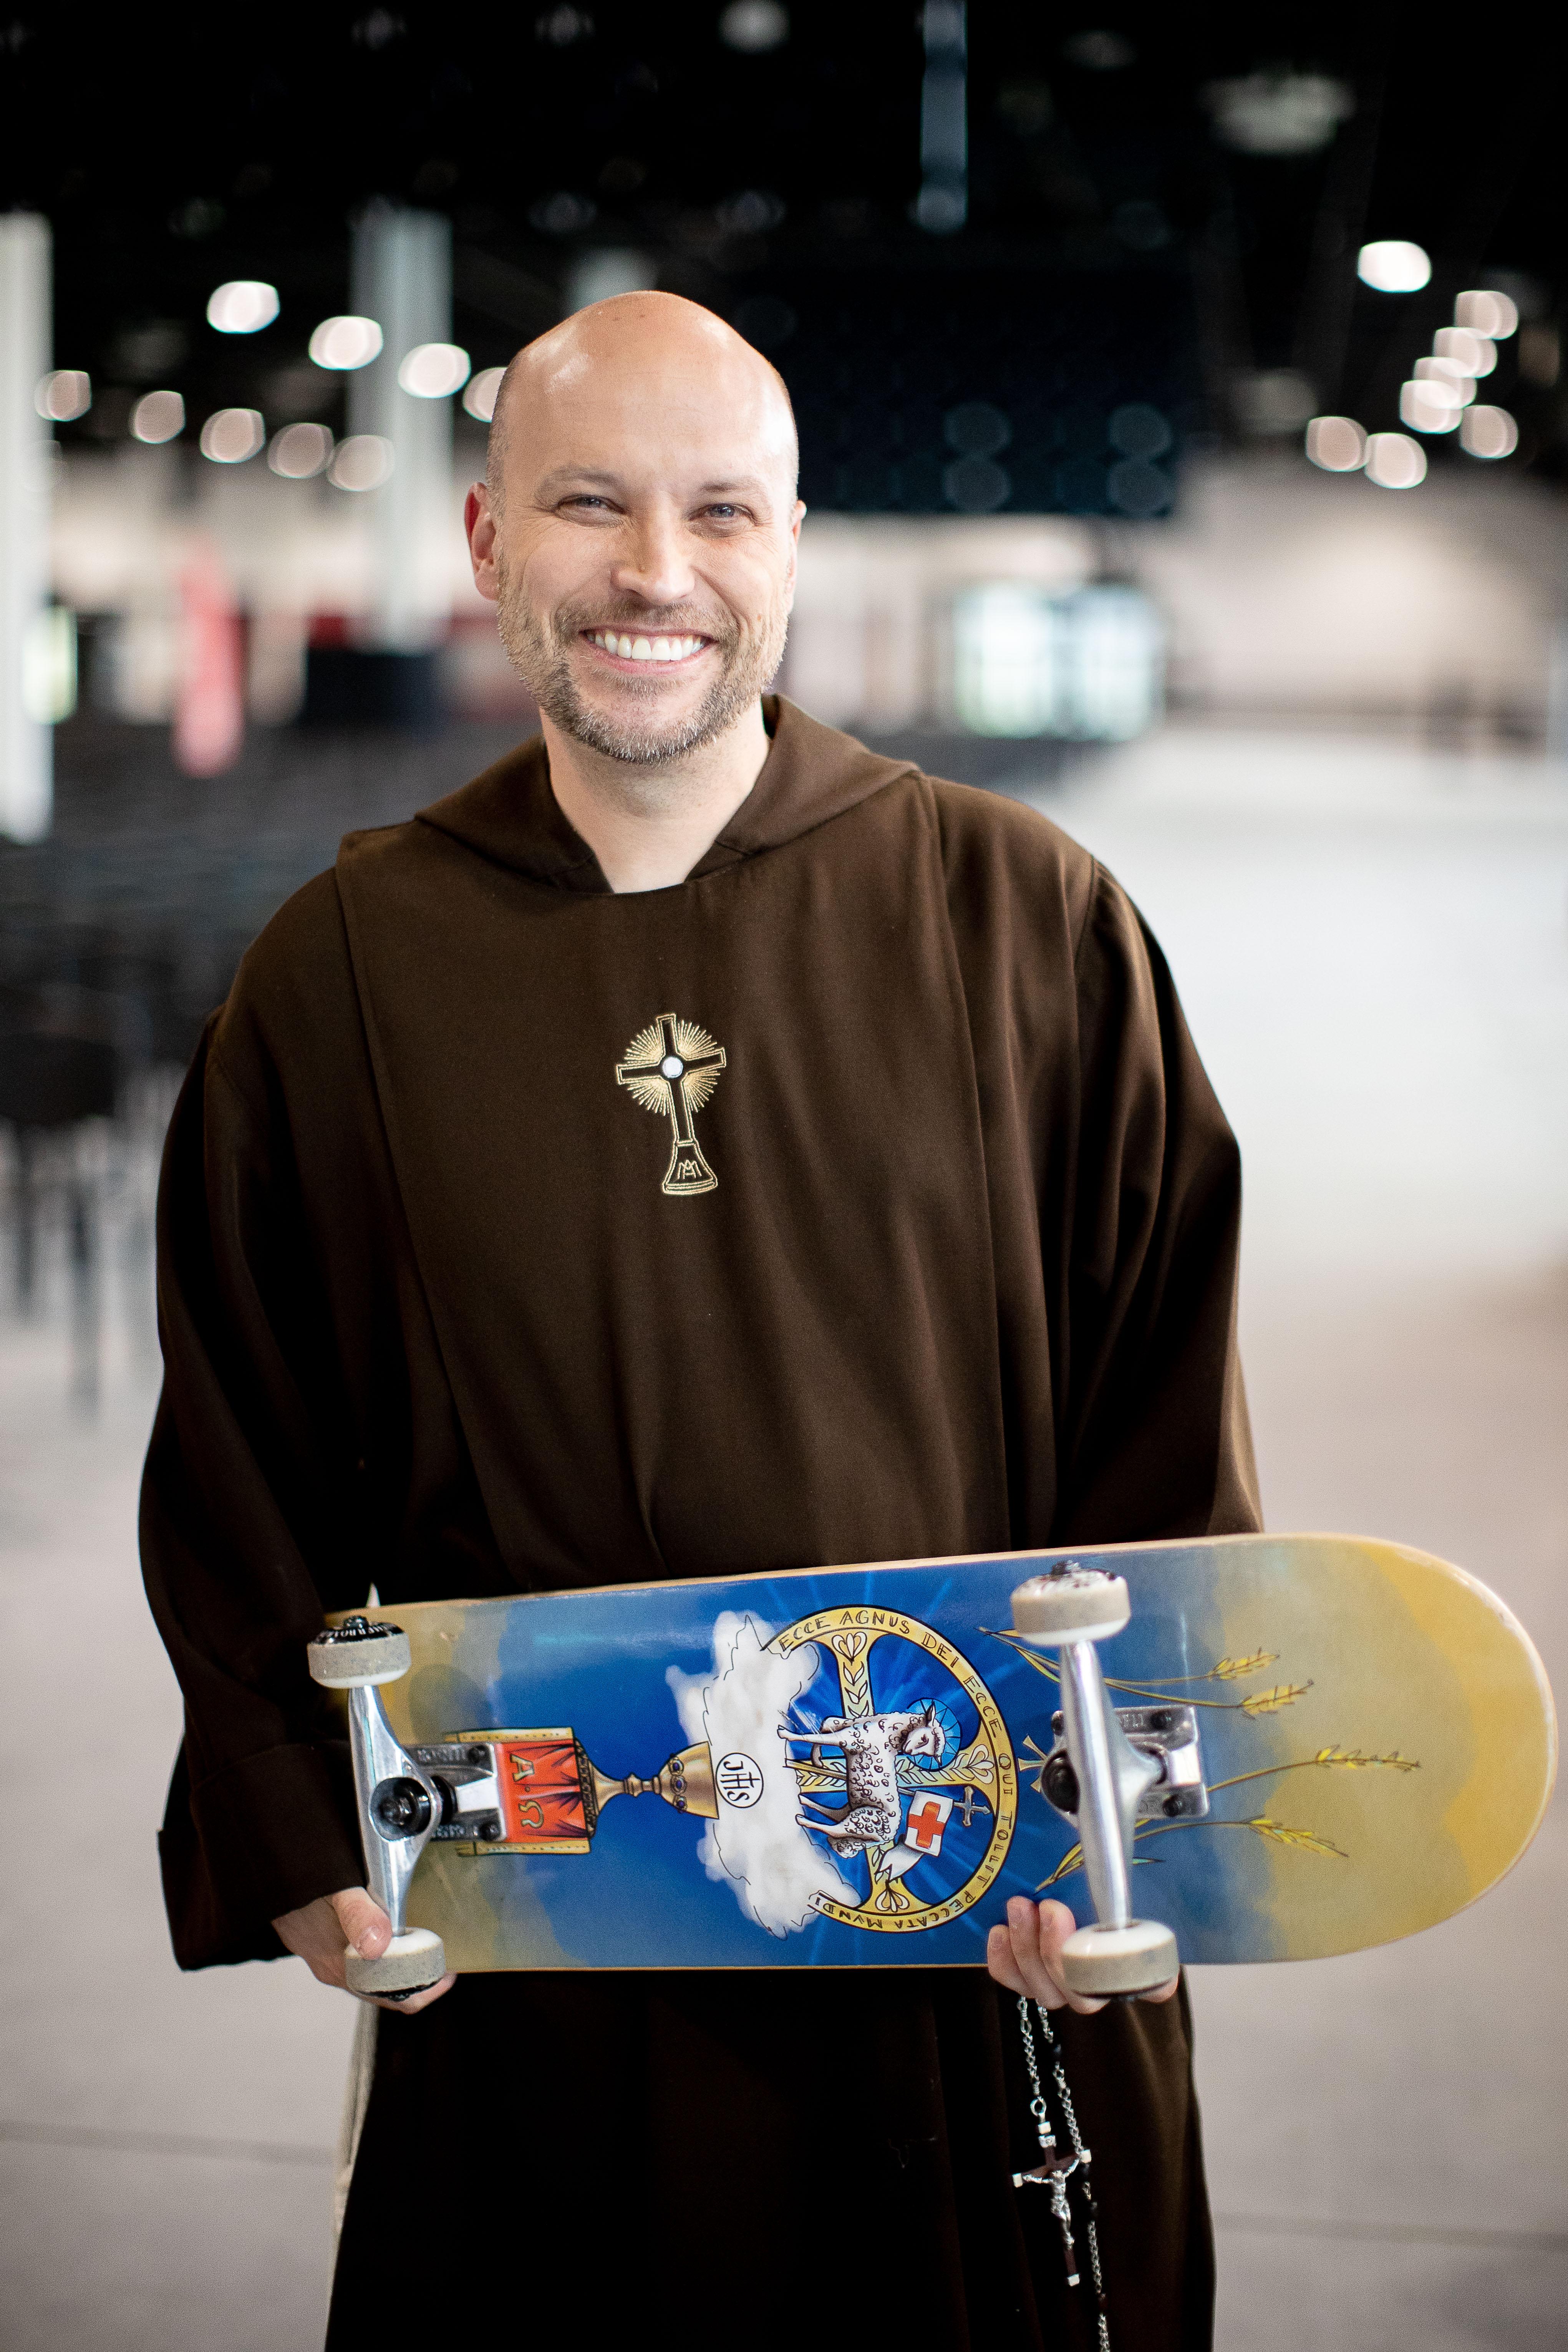 Father John Paul Zeller skates around the International Eucharistic Congress.